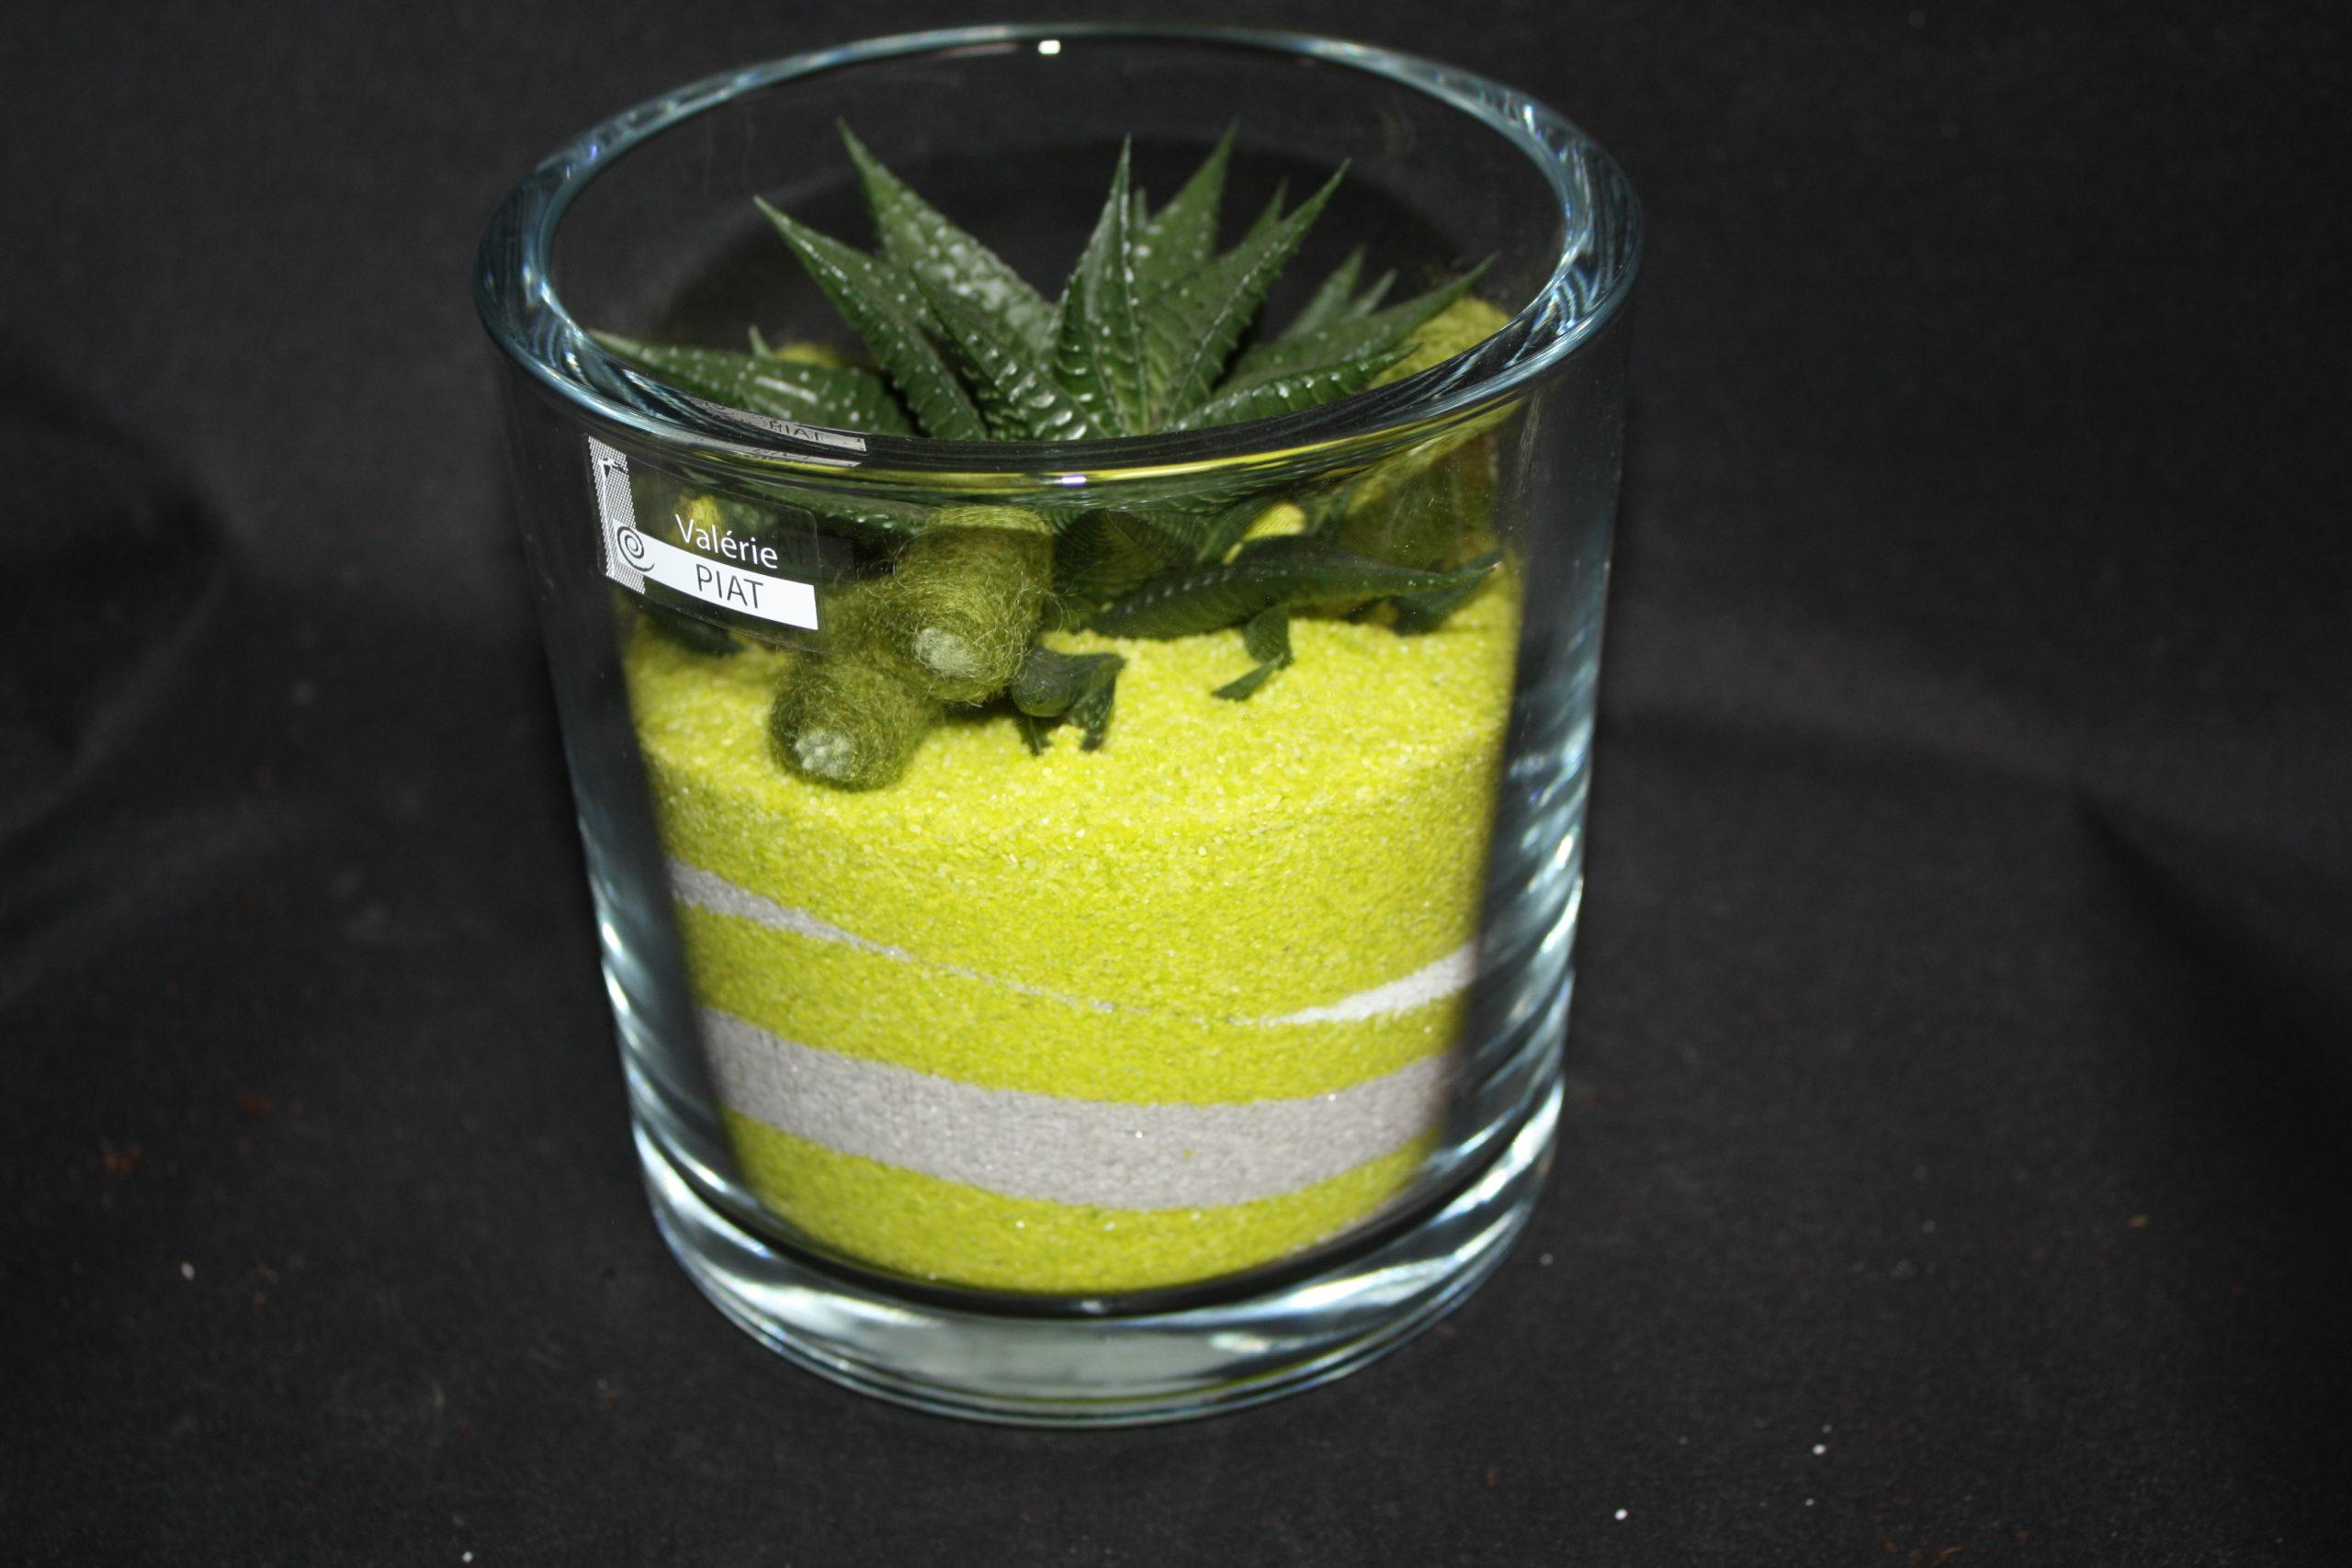 Aloes dans vase de sable vert